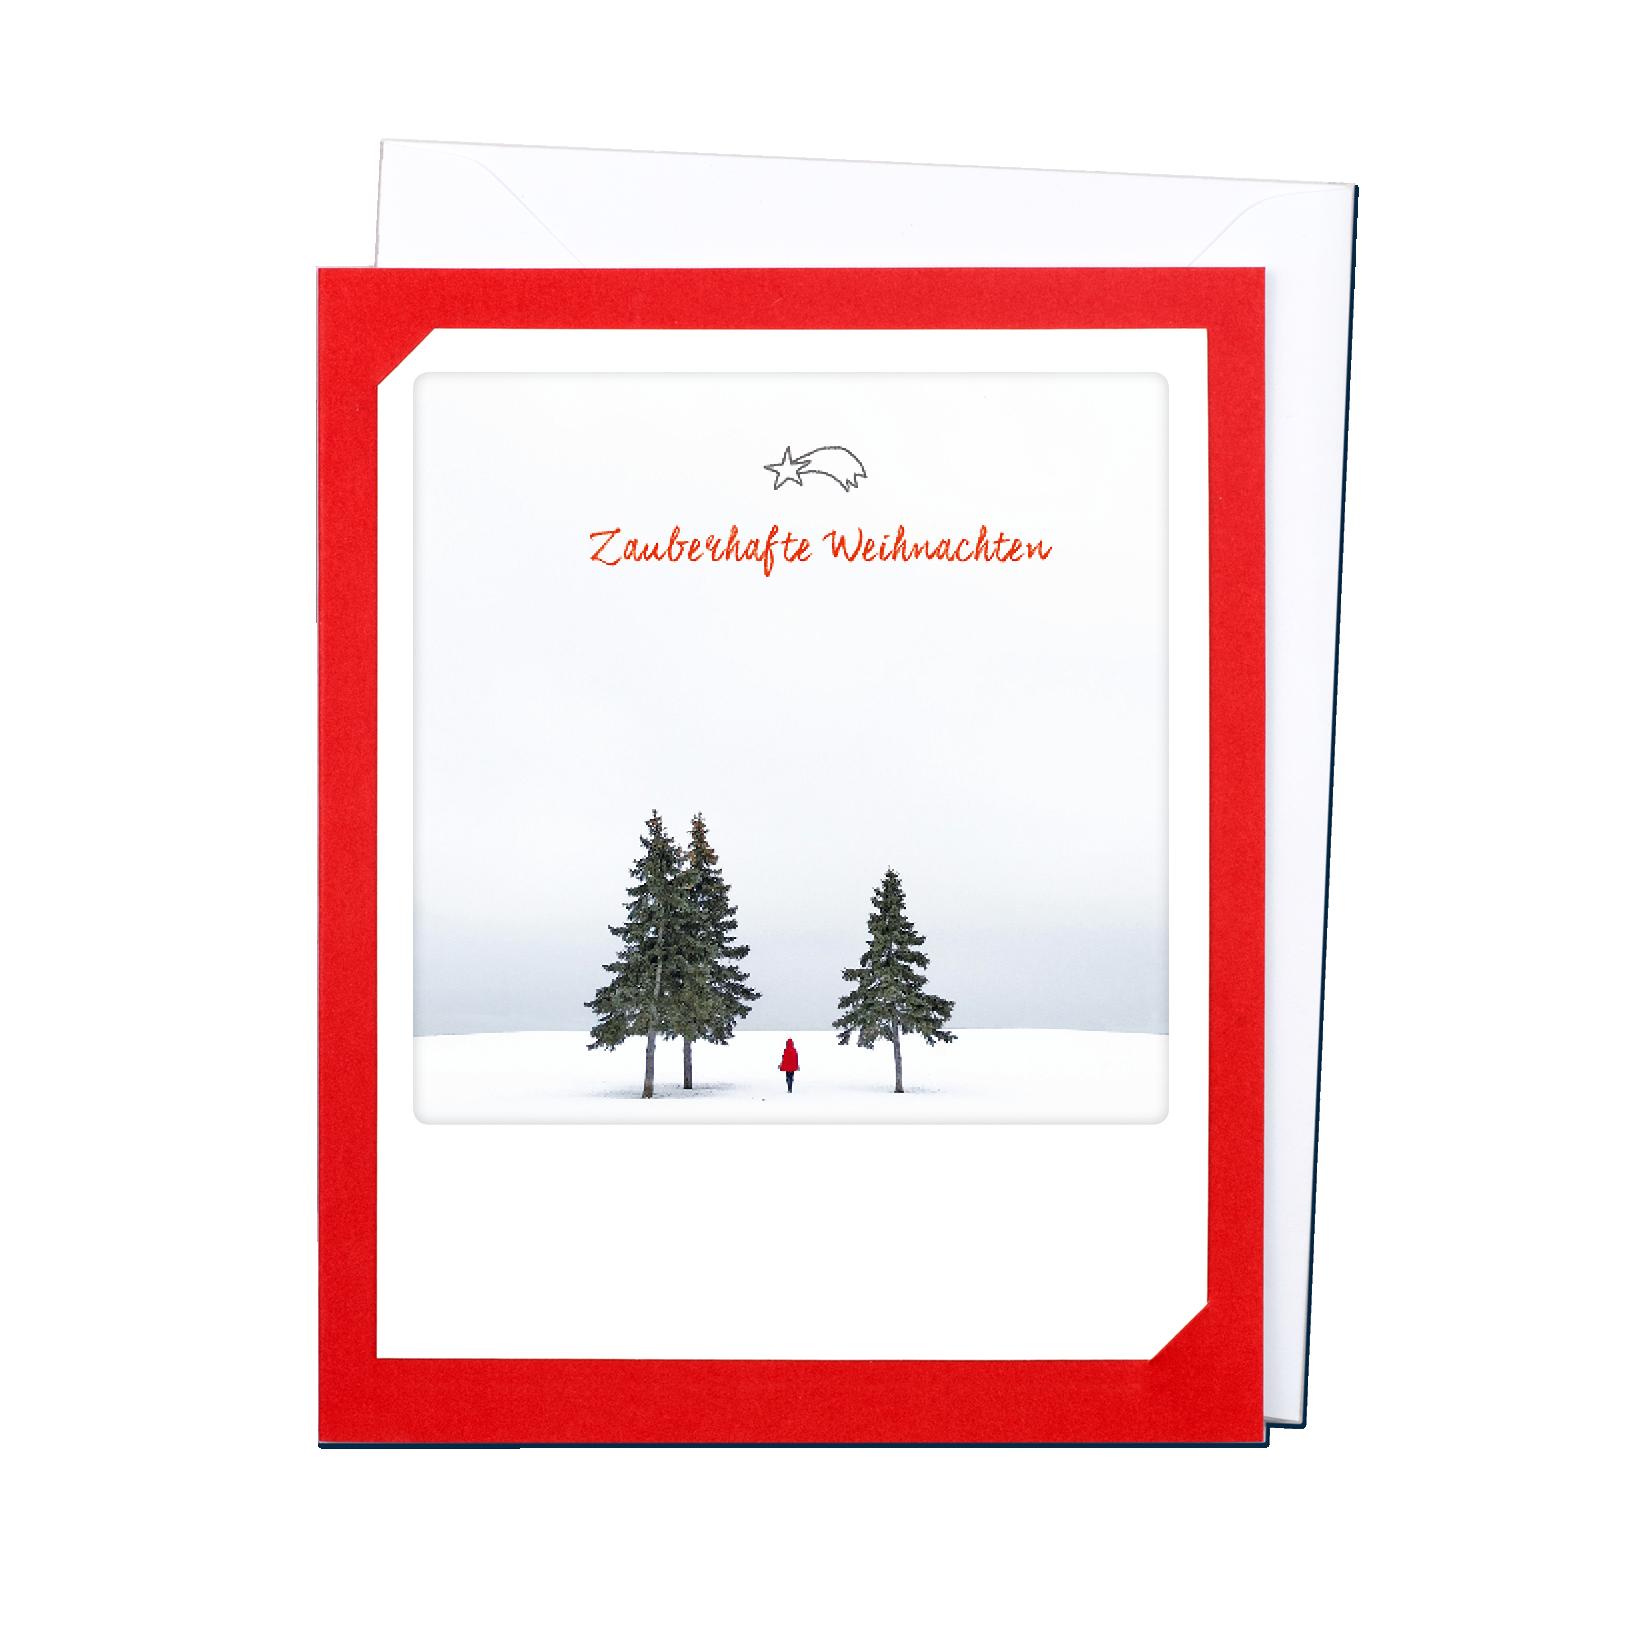 "Photo-Klappkarte ""Zauberhafte Weihnachten"" - XM-0154-DE-KK - Pickmotion (Xmas)"